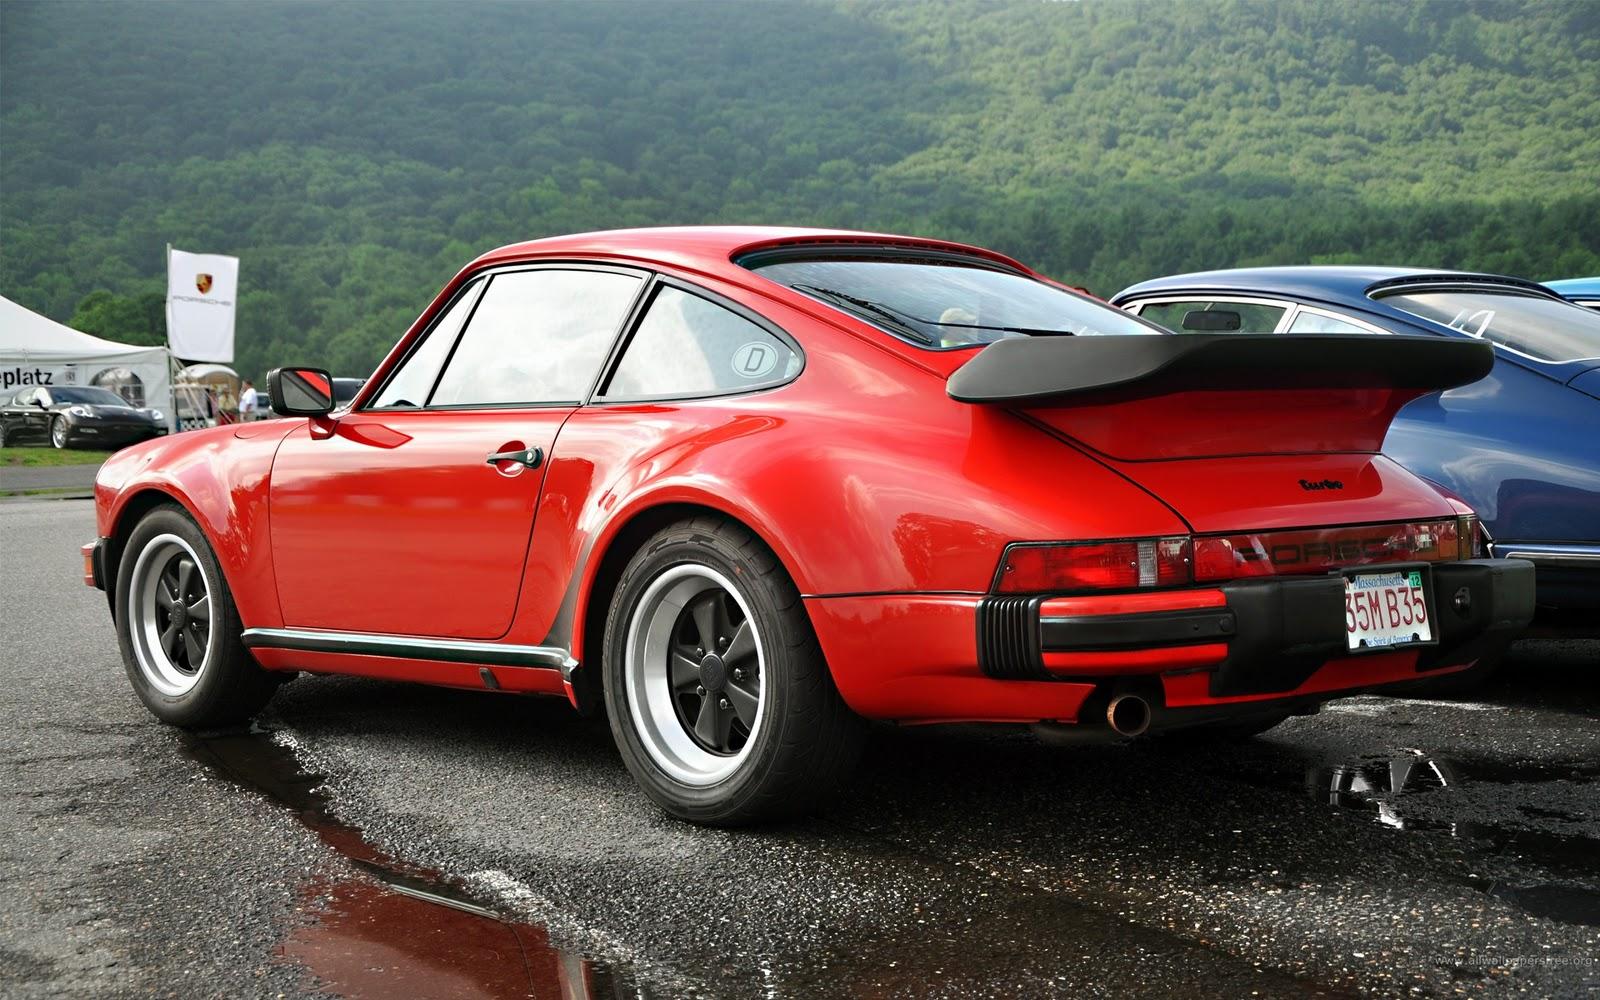 Classic Porsche 911 RS Carrera turbo wallpapers The Wallpaper 1600x1000